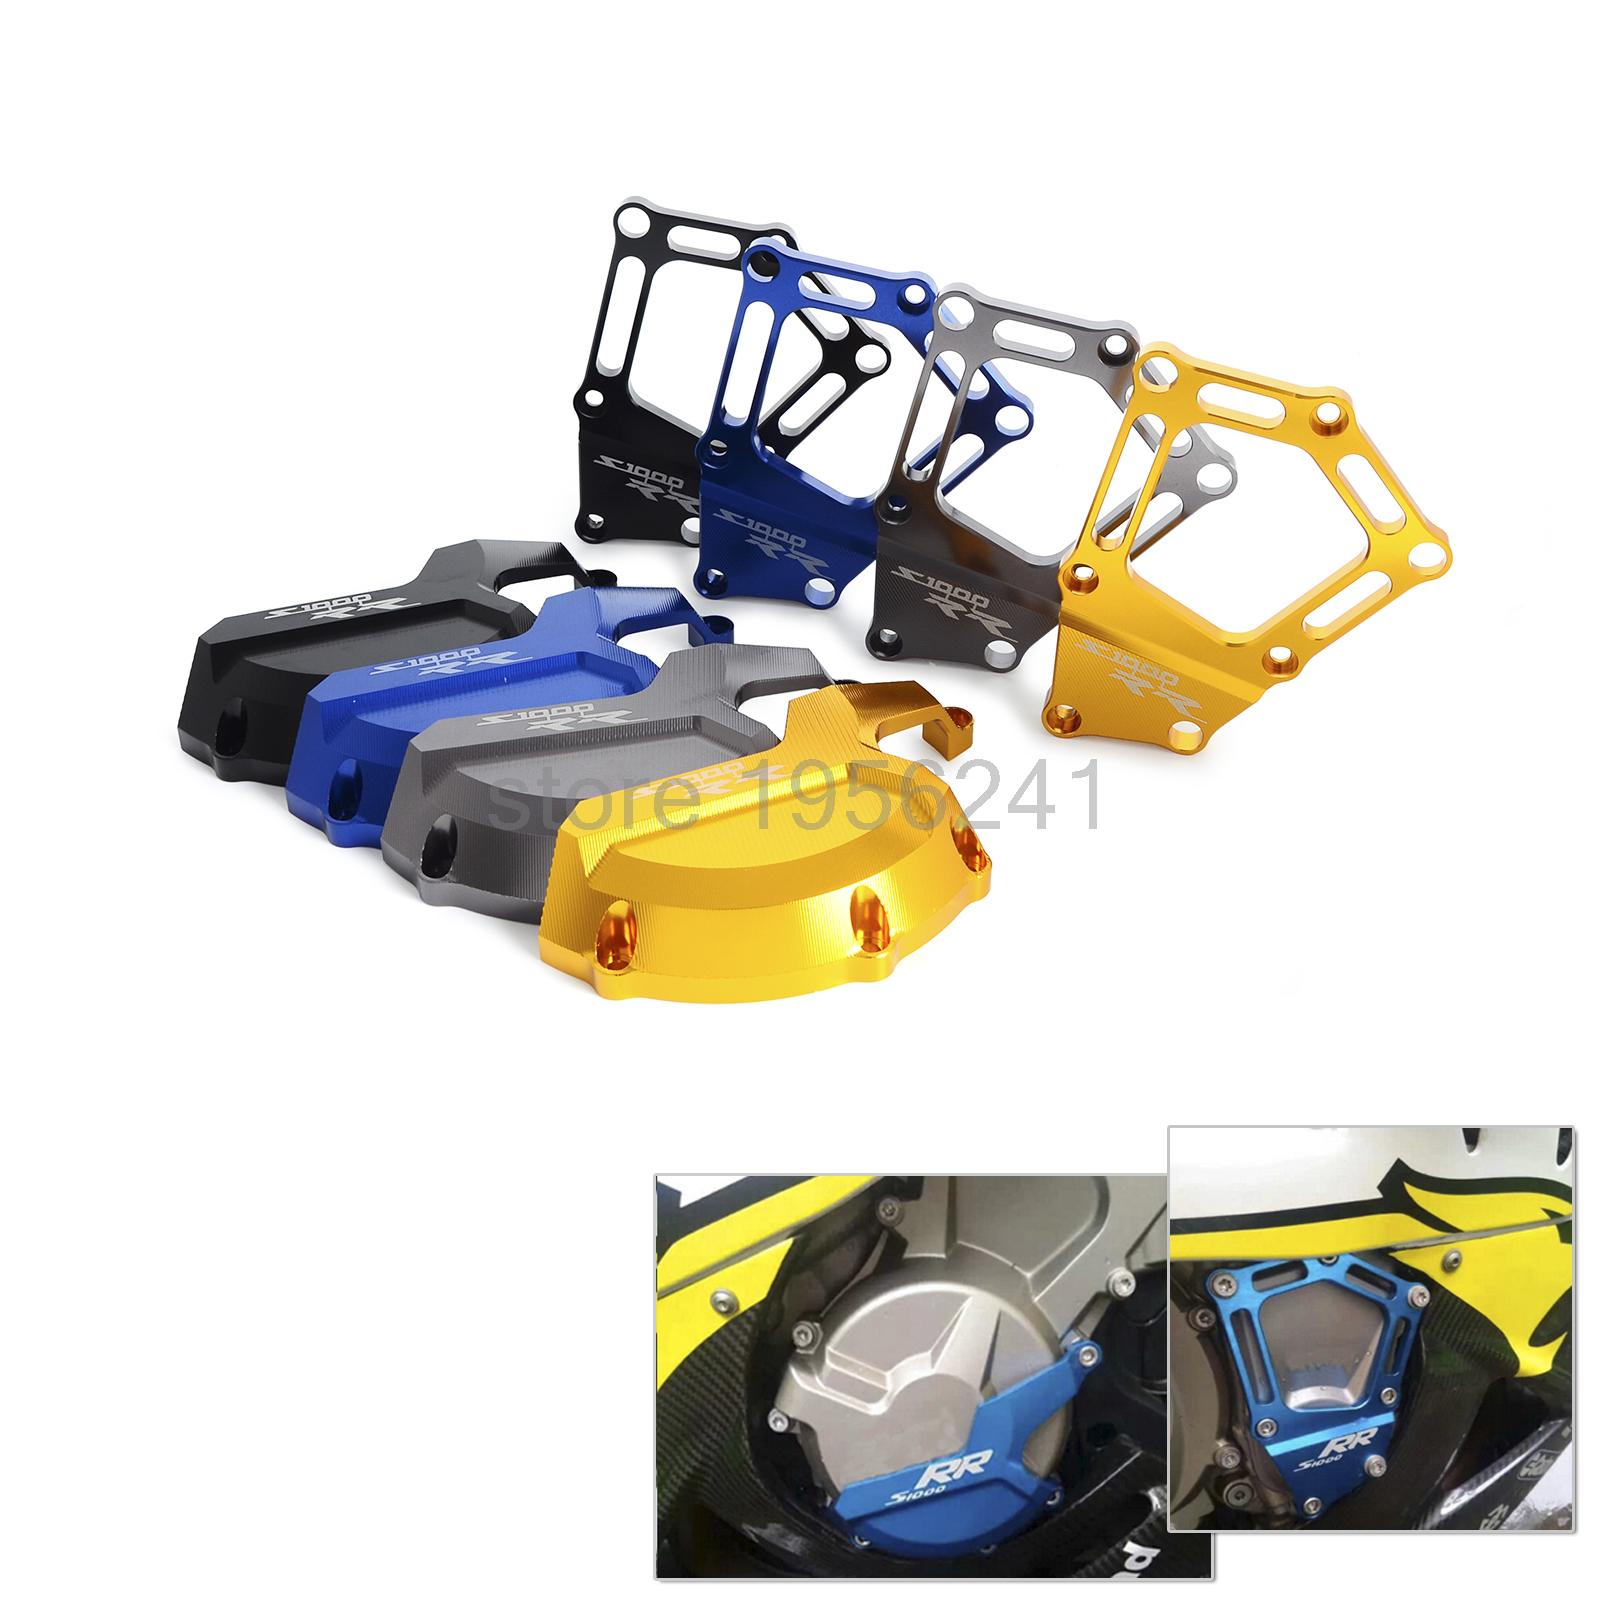 Двигатель статора стартера Рамка Slider протектор для BMW HP4 2012-2014 S1000R 2014-2017 S1000RR 2010- 2017 S1000XR 2015-2017